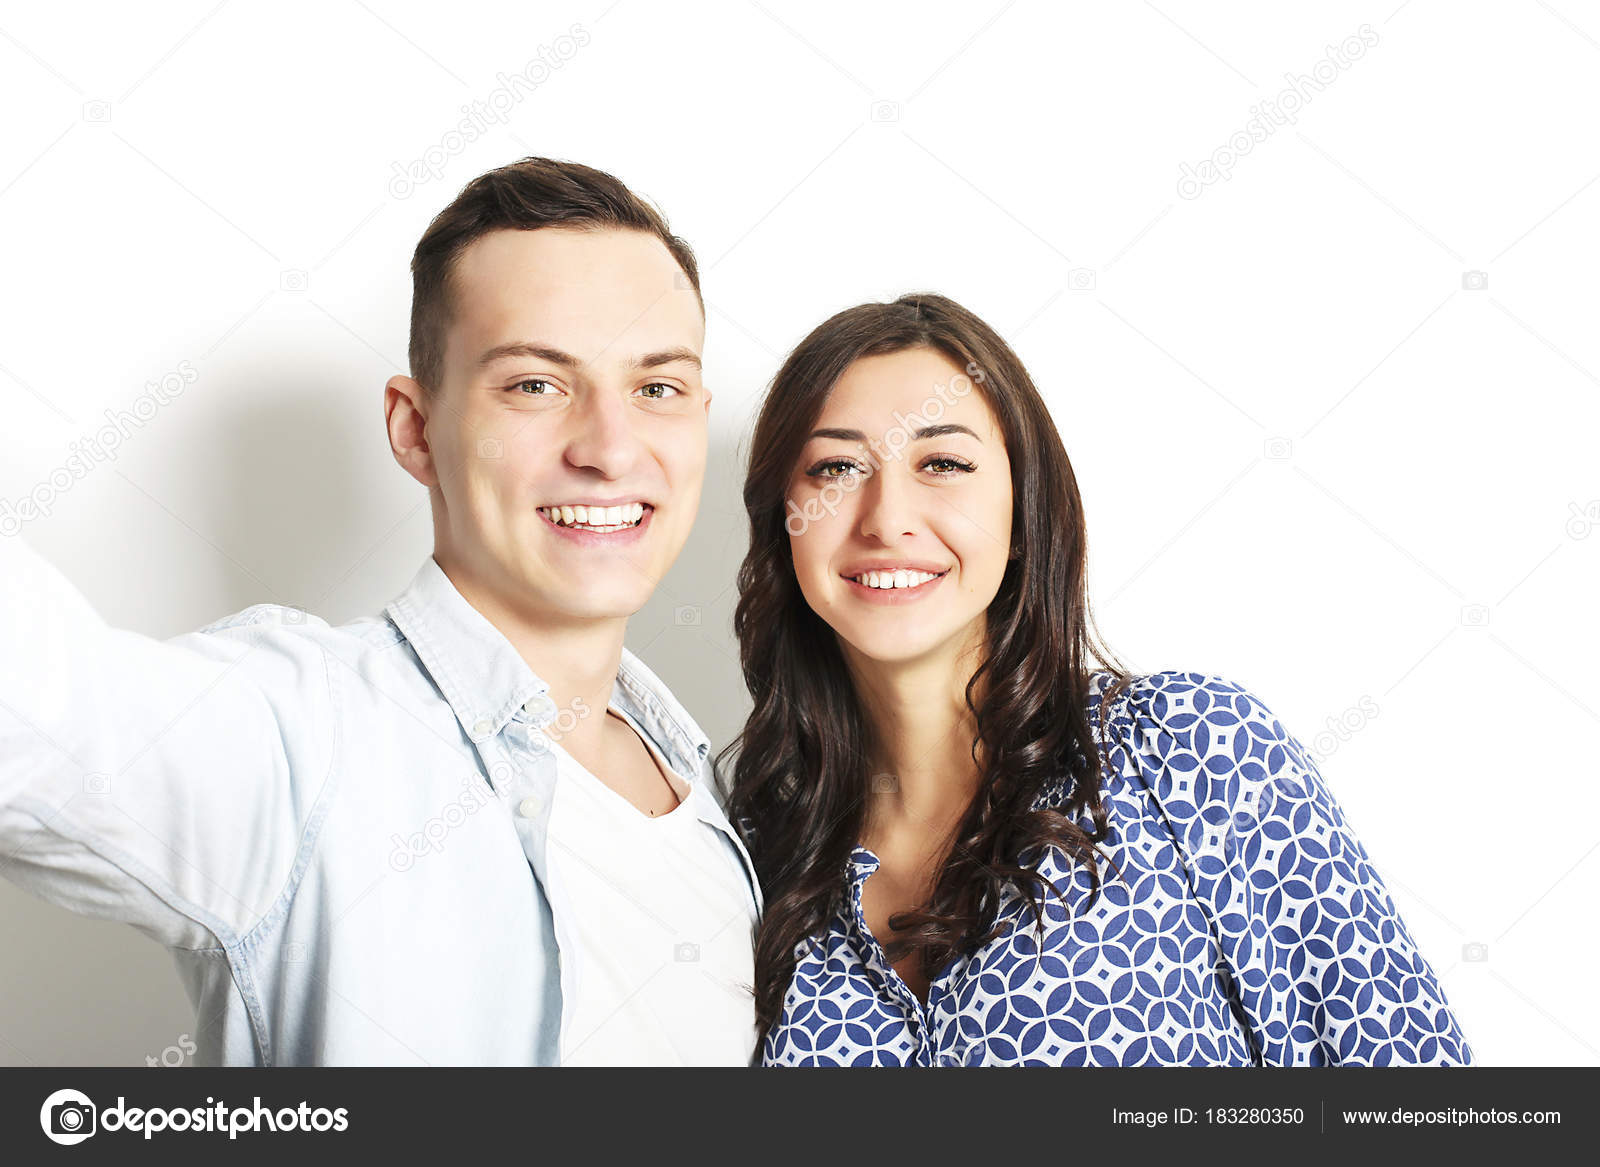 Dating online di maschio americano